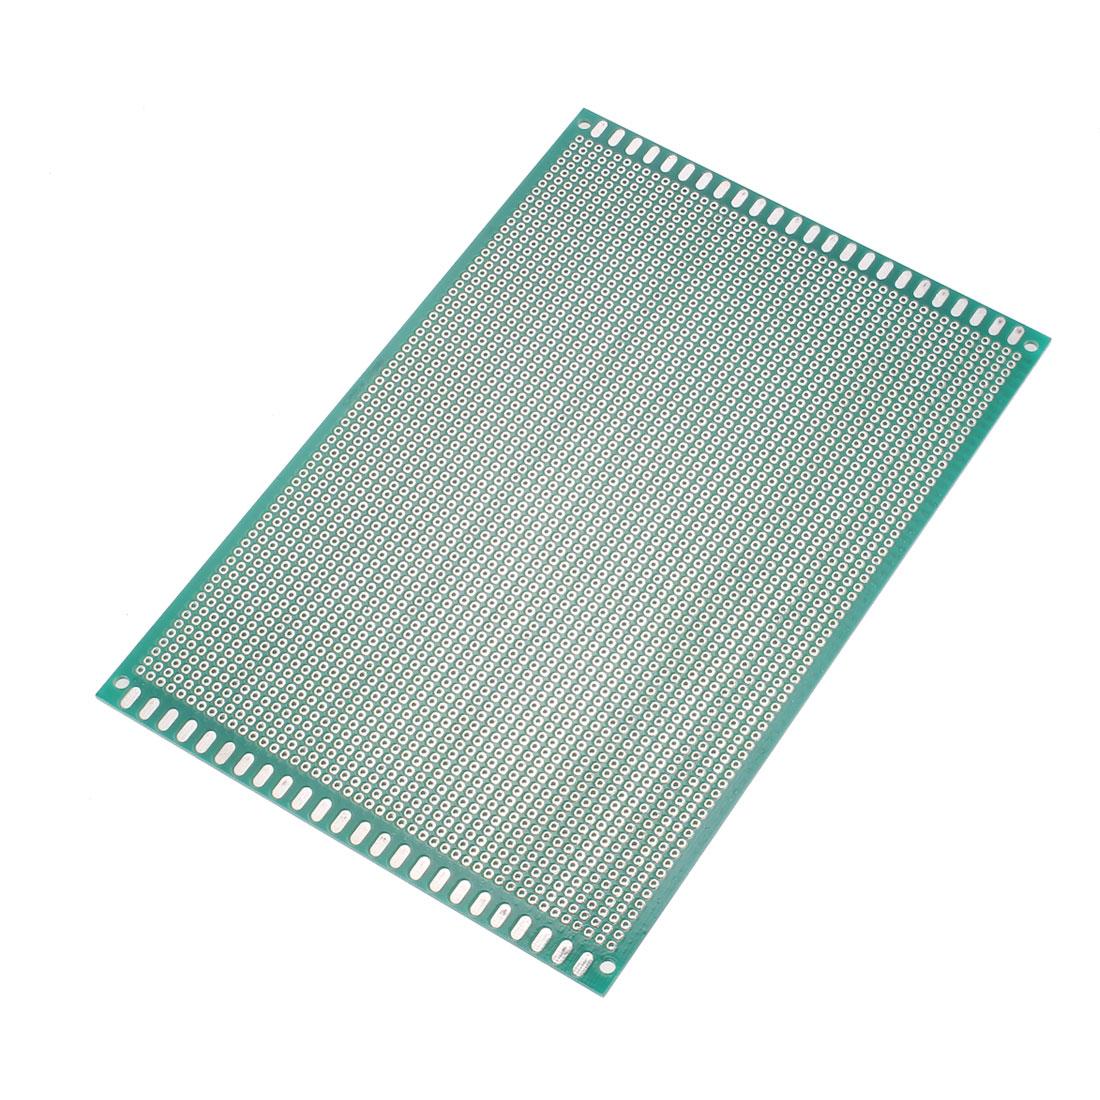 DIY Universal Prototype Paper PCB Printed Circuit Test Board 12 x 18cm